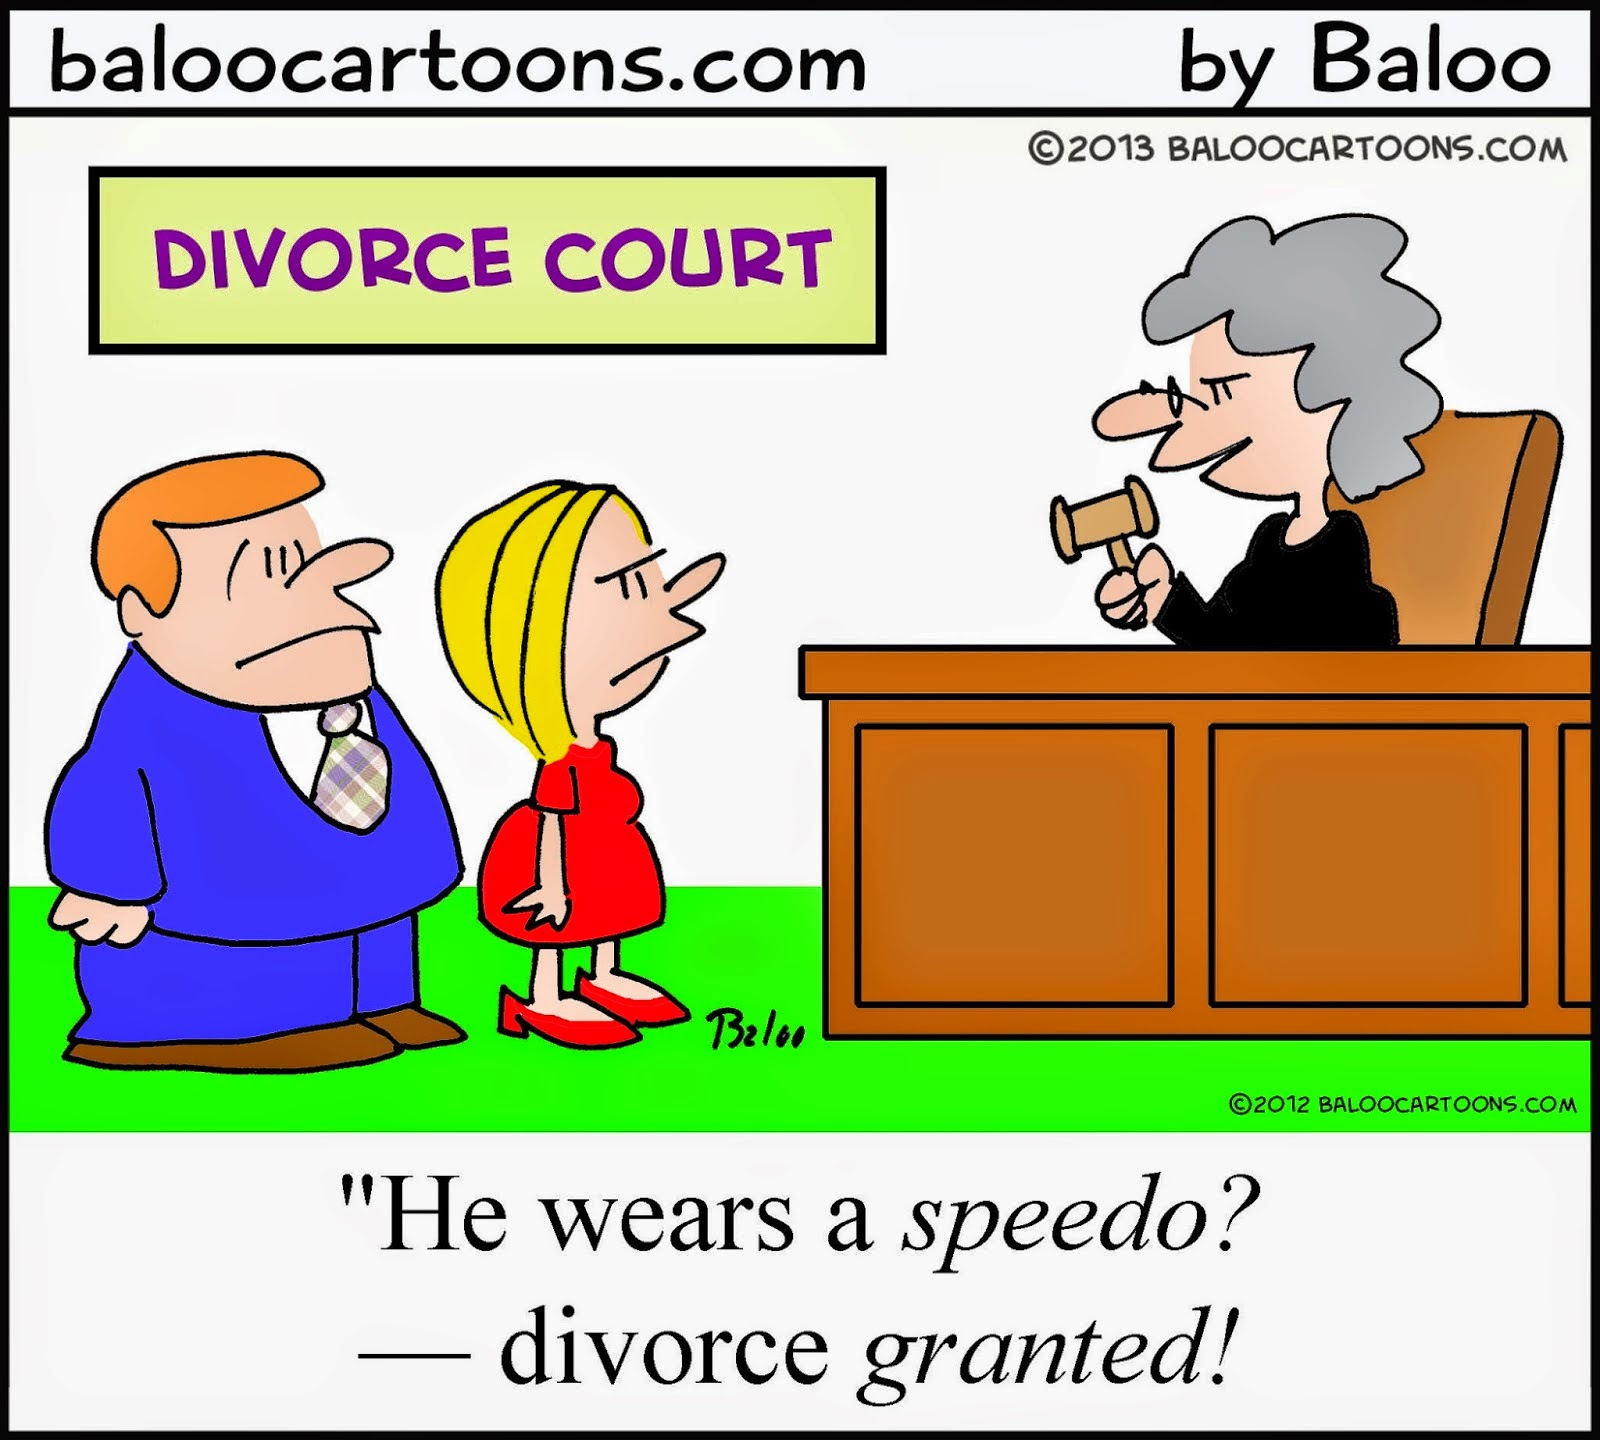 humor hump divorce cartoon amish project barn